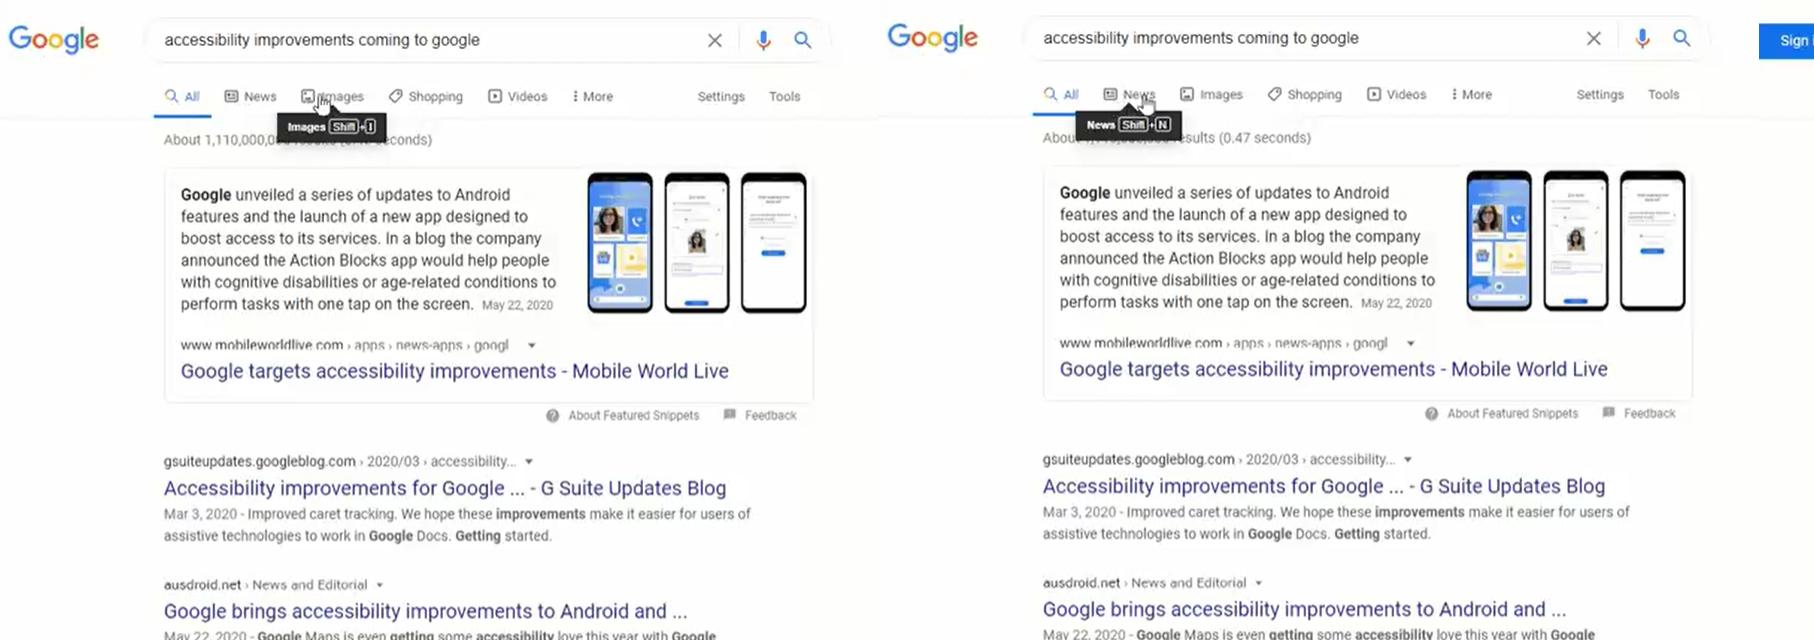 Google Tests Keyboard Shortcuts on SERPs